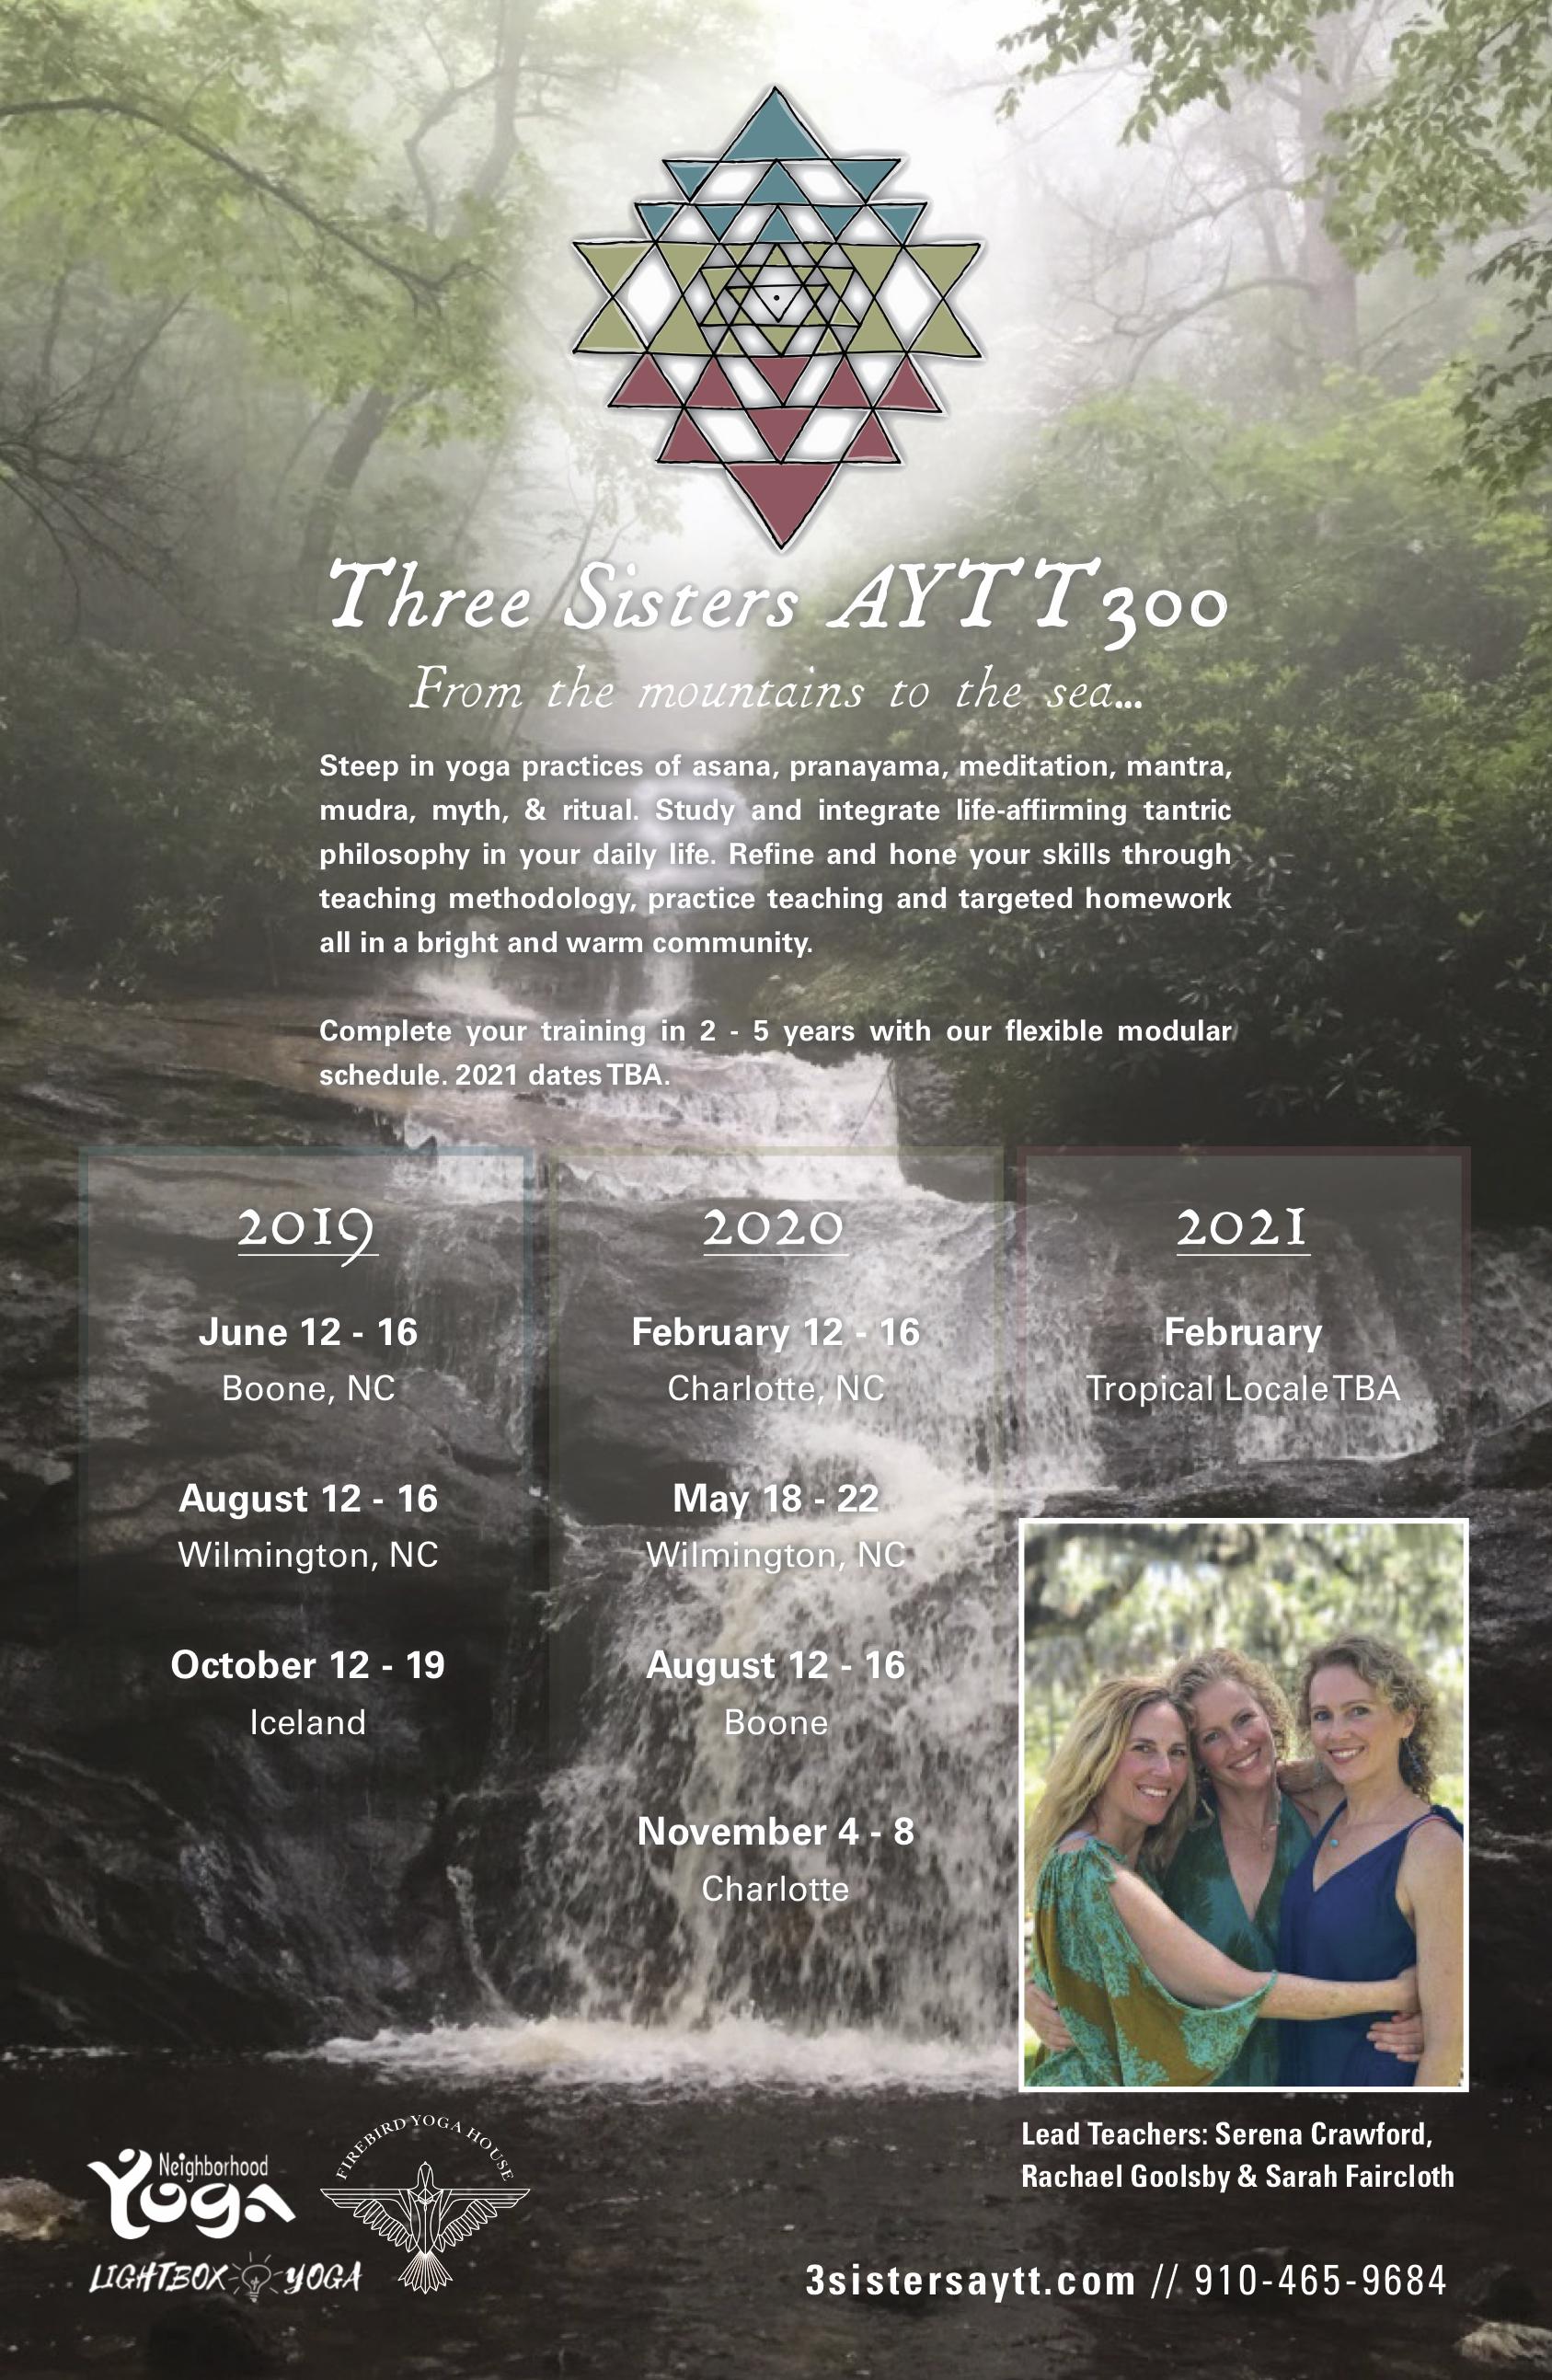 Three-Sisters-AYTT300-11x17-Flyer_FINAL-no-bleeds.jpg